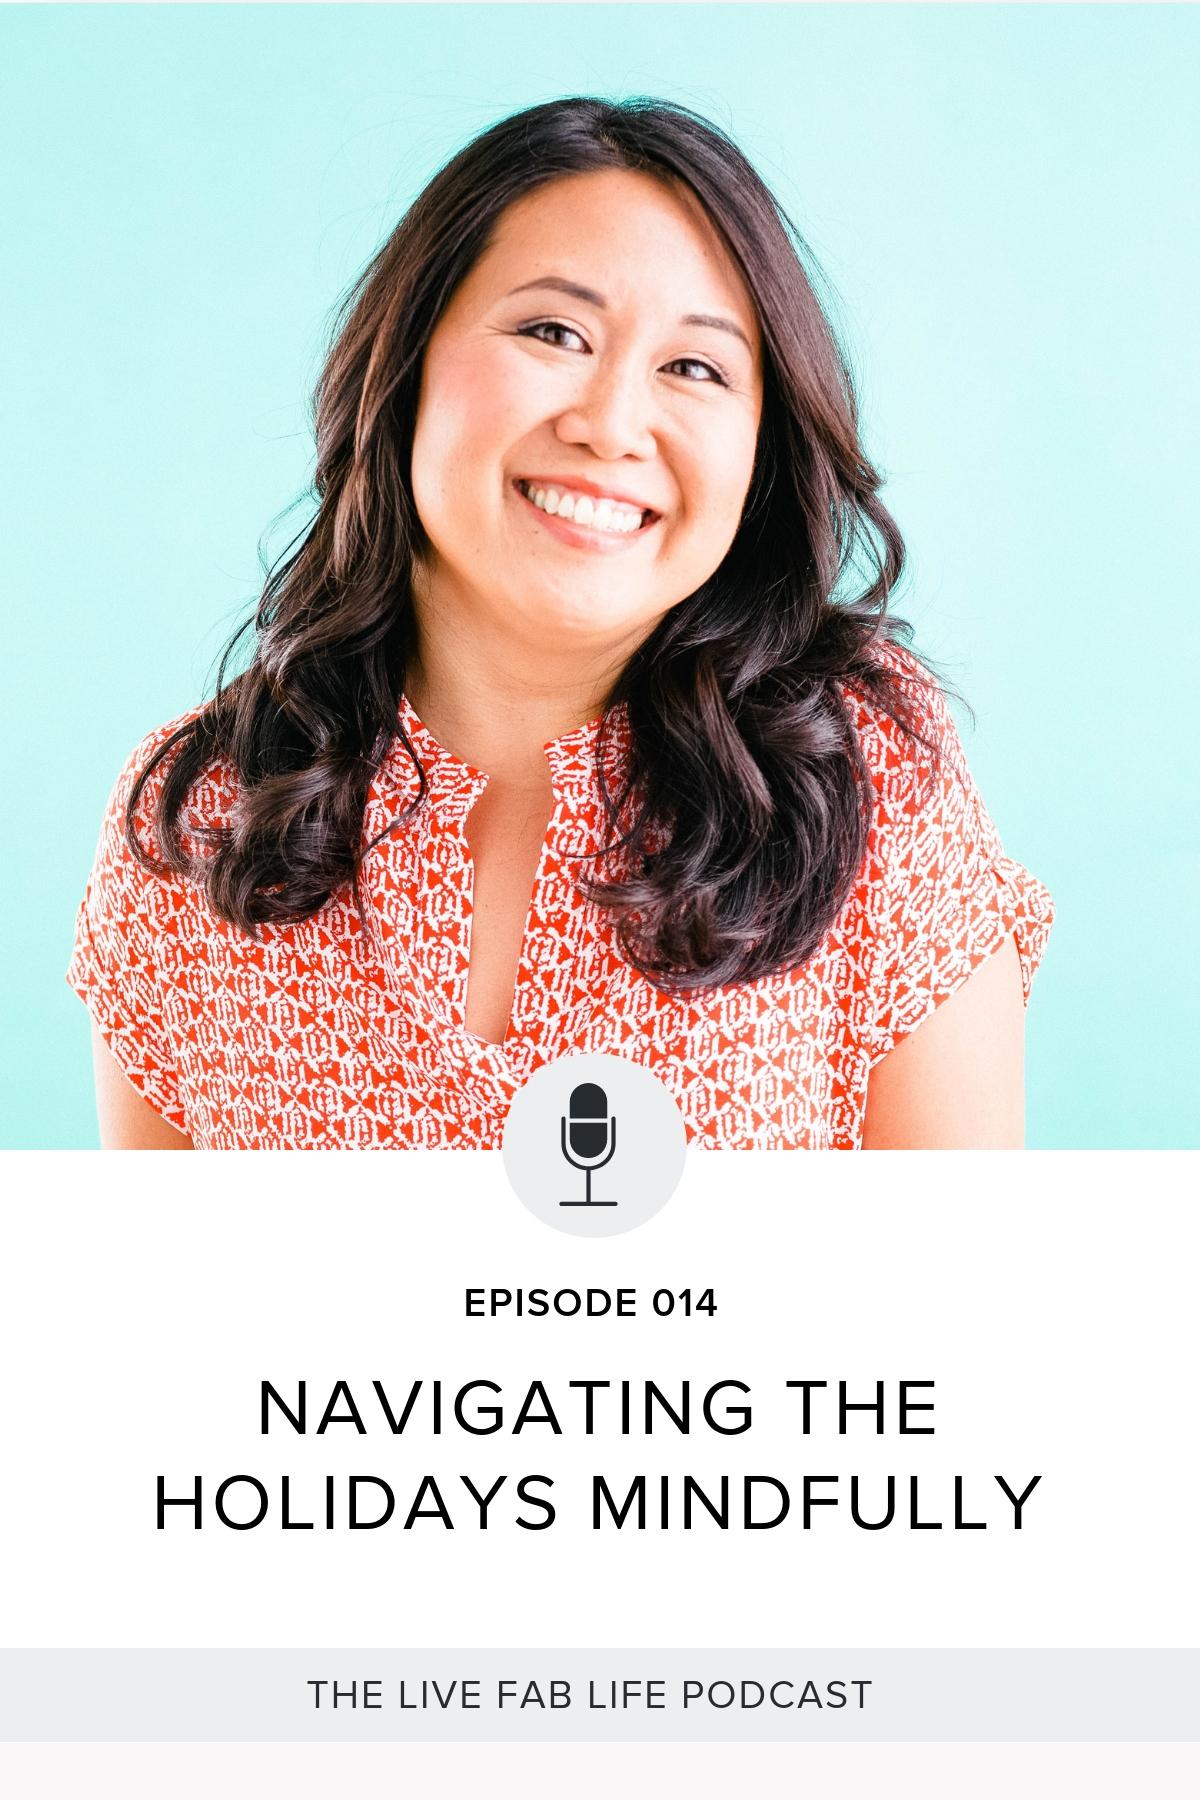 Episode 014: Navigating the Holidays Mindfully